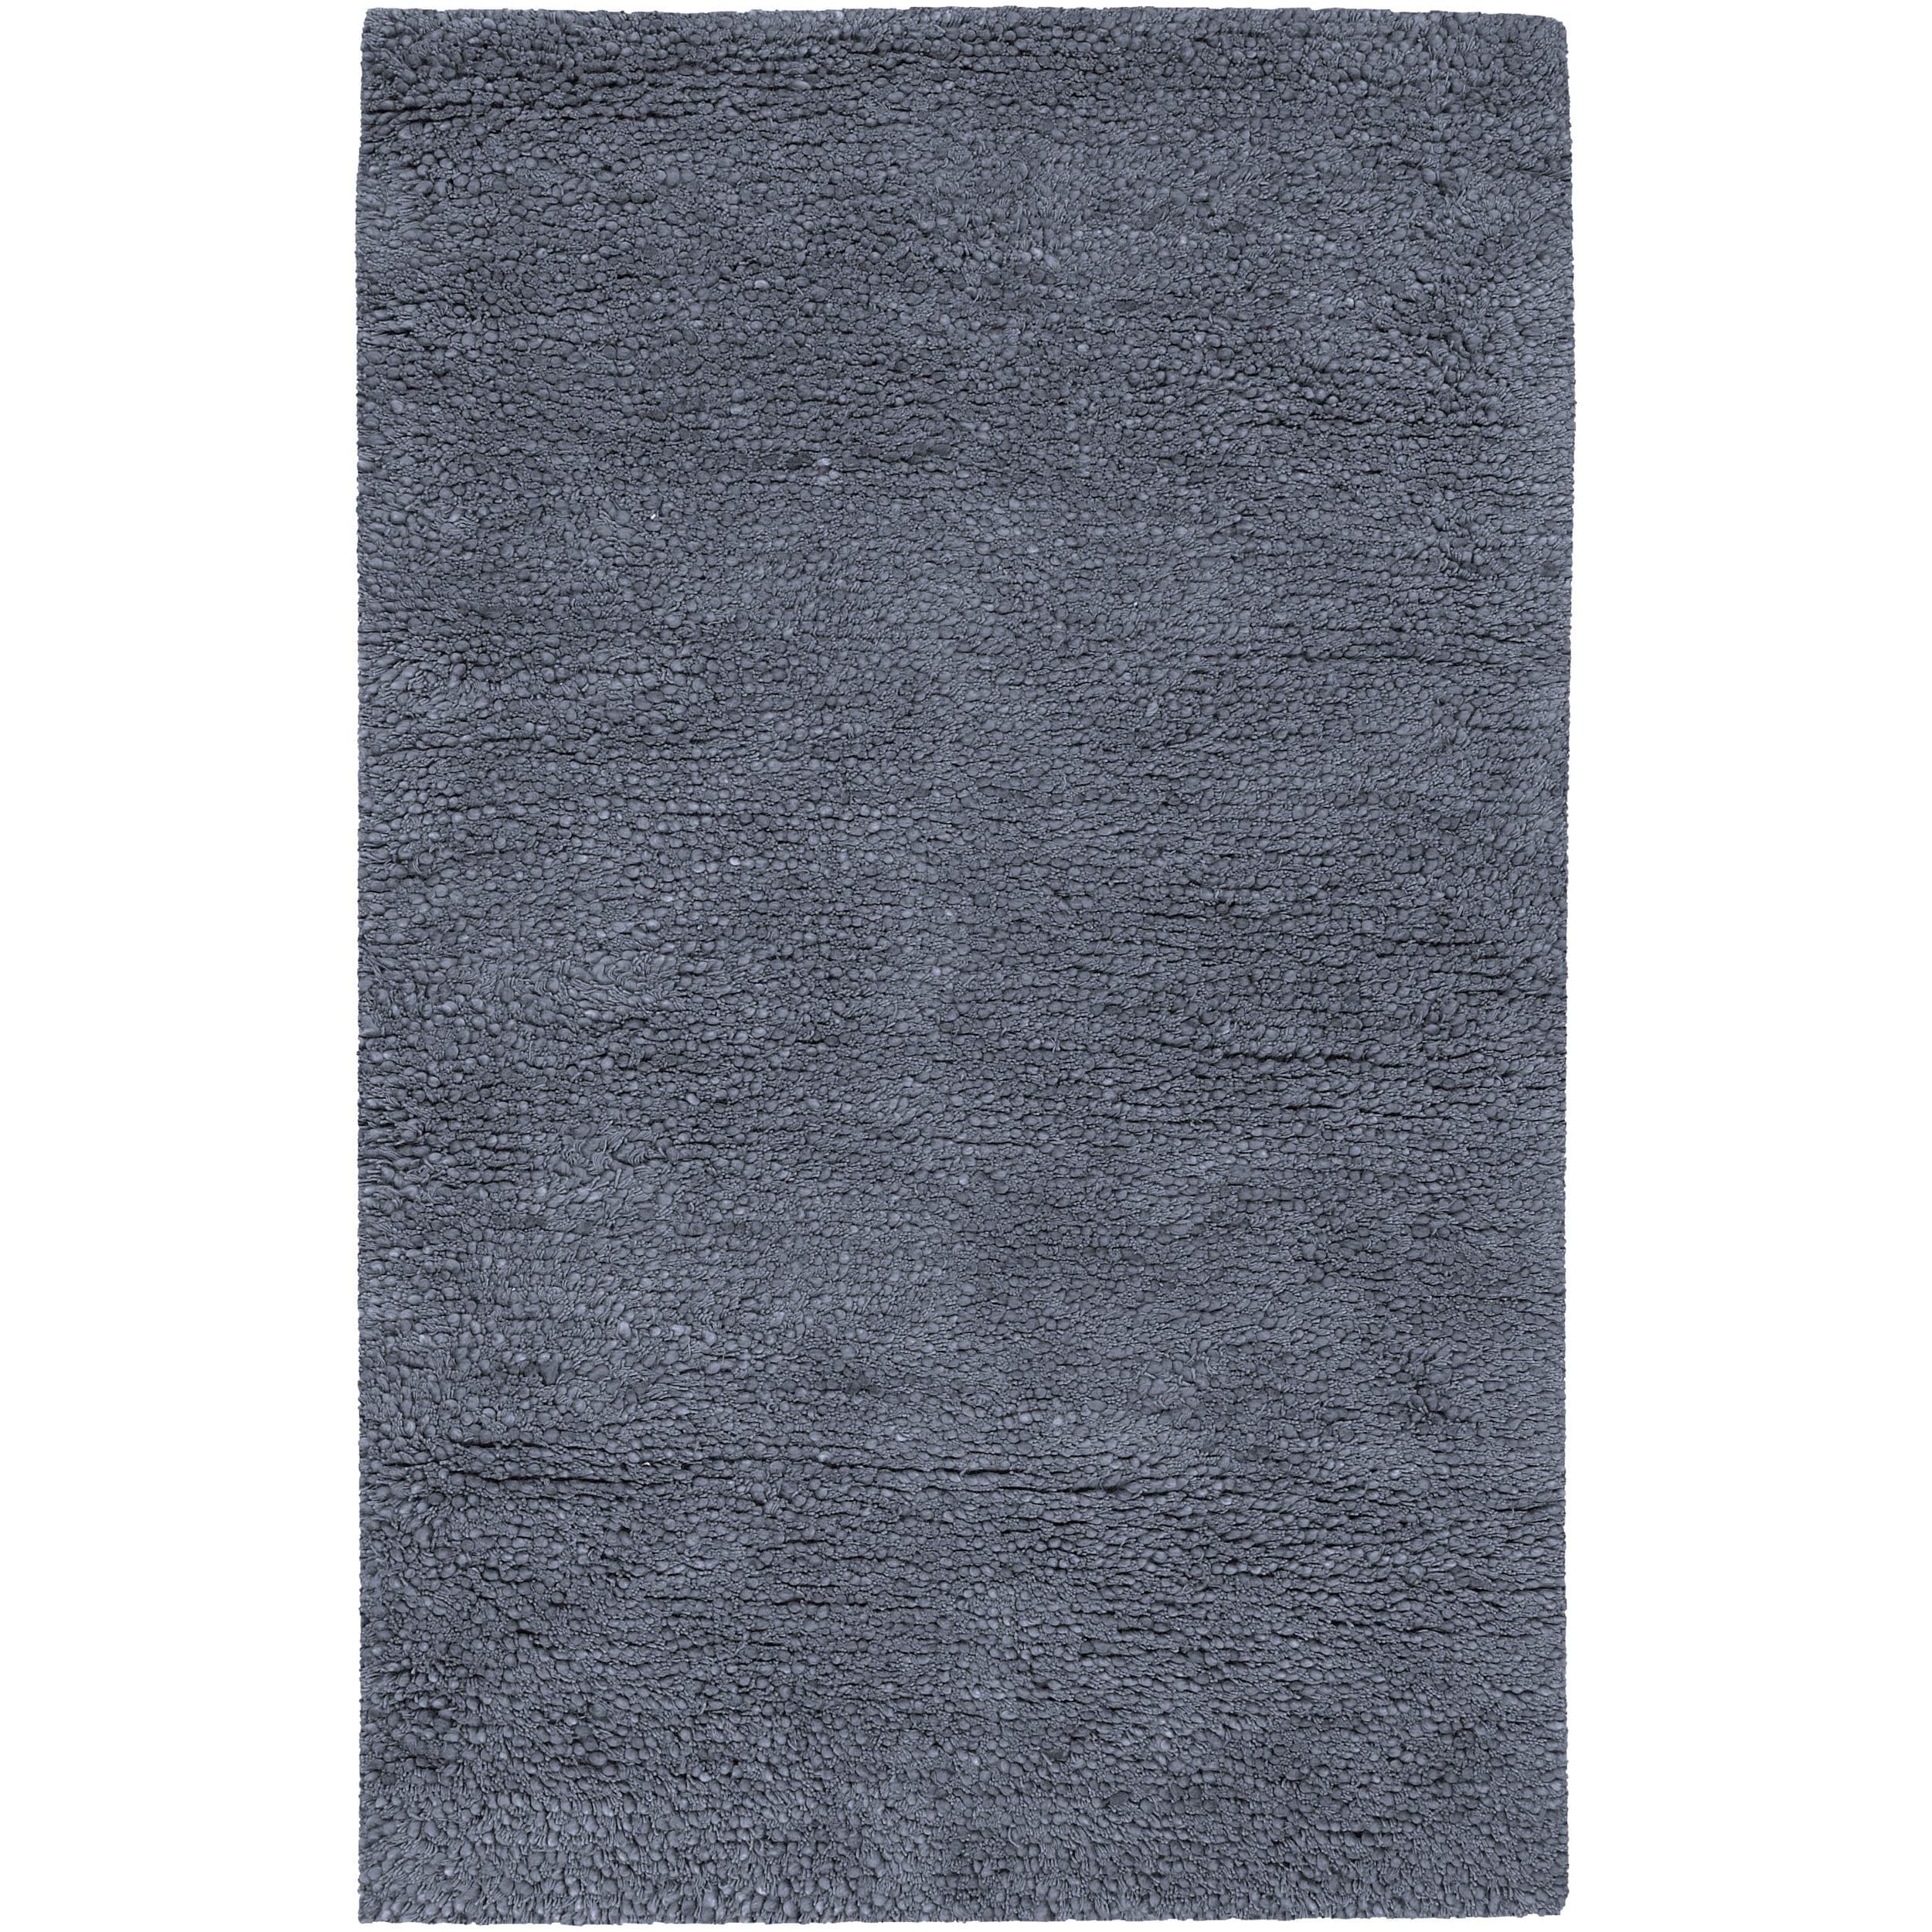 Hand-woven Metropolitan New Zealand Wool Plush Shag Rug (8' x10'6)